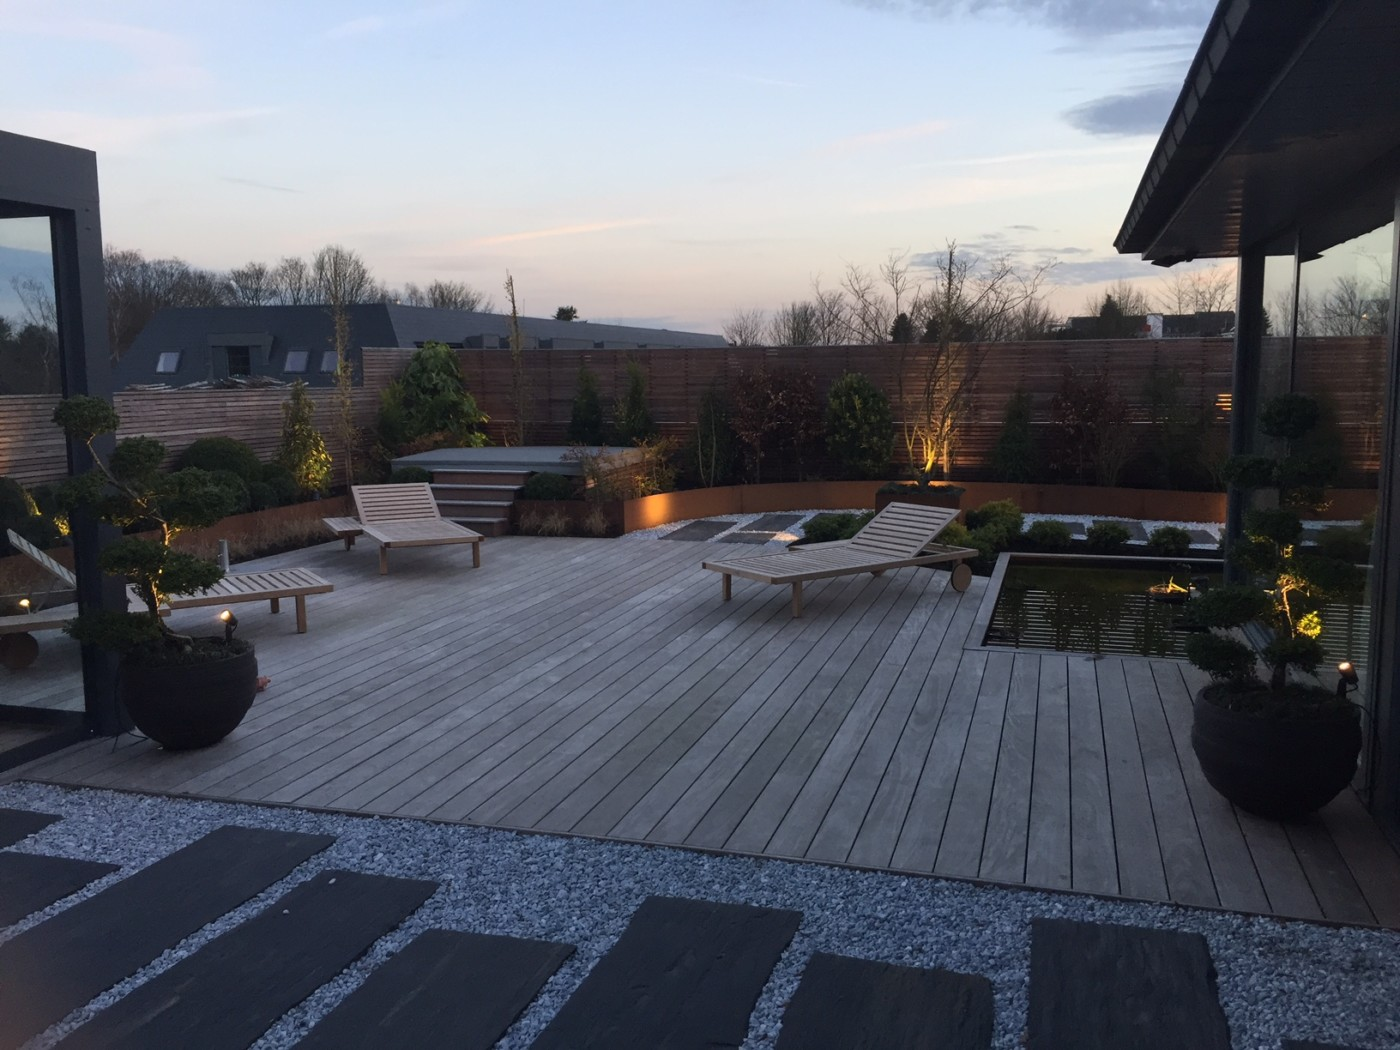 Terrasse pierre et bois terrasse pierre et bois les plus - Terrasse en pierre ...